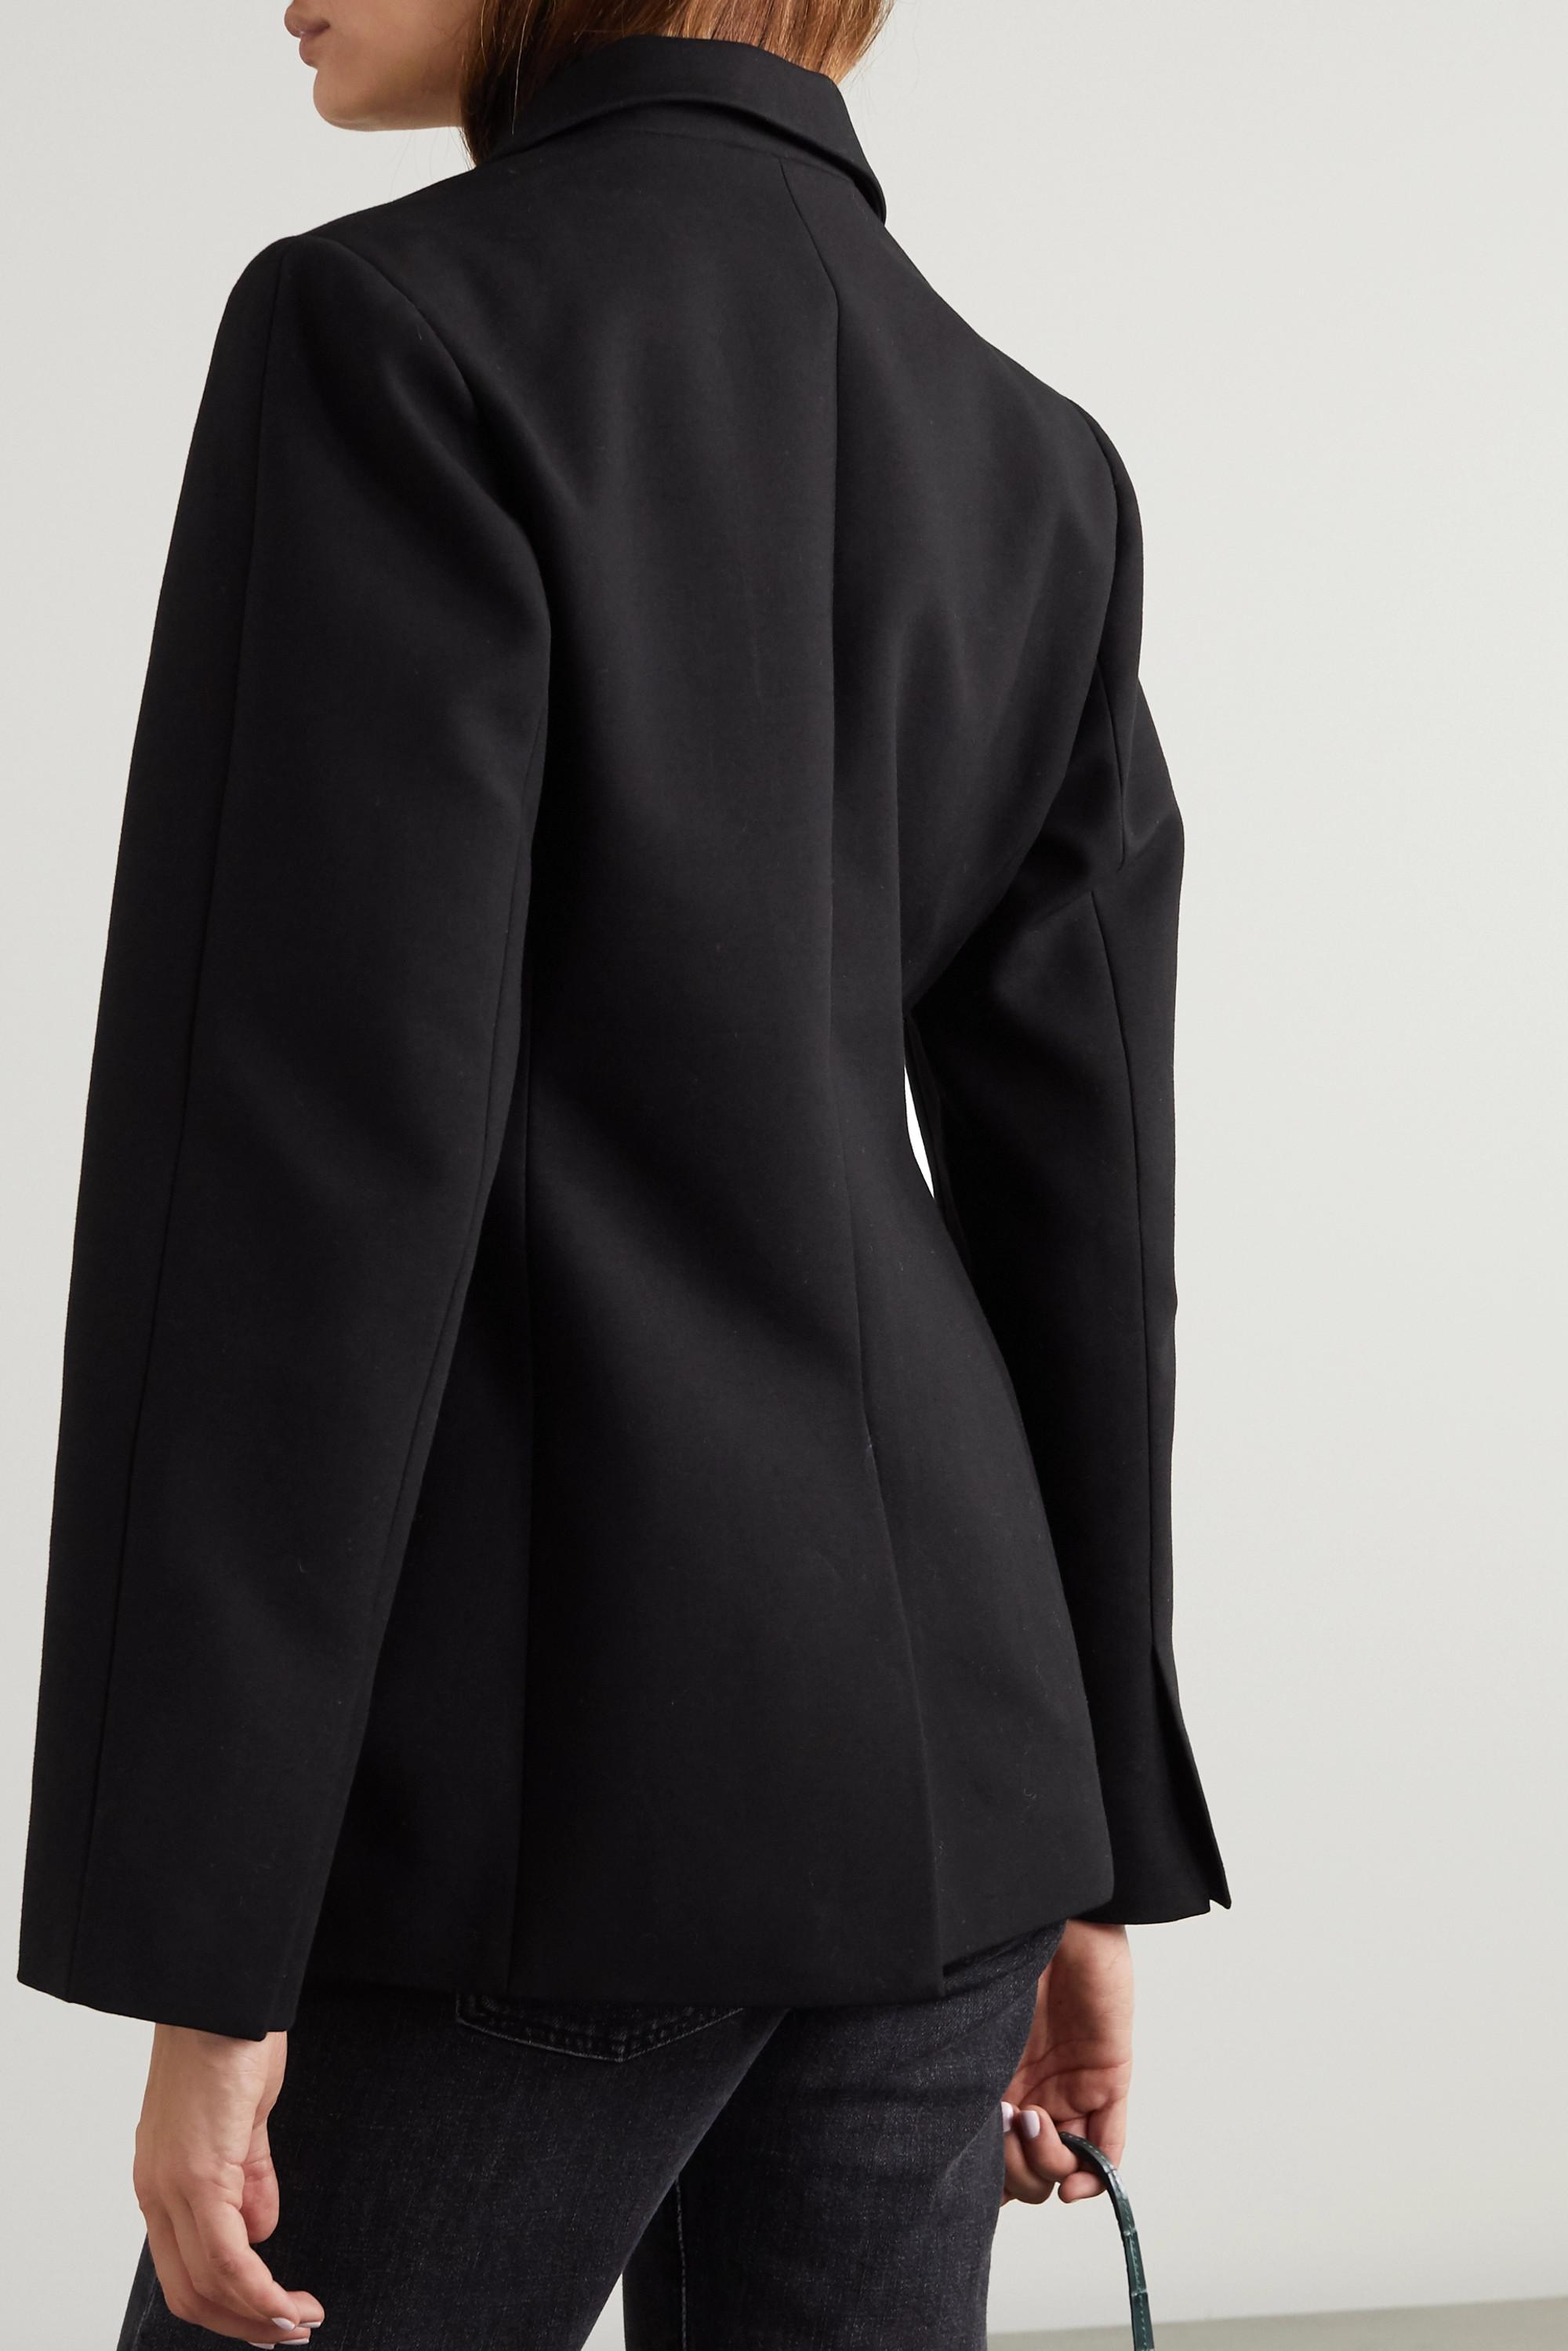 Frankie Shop Cotton blazer